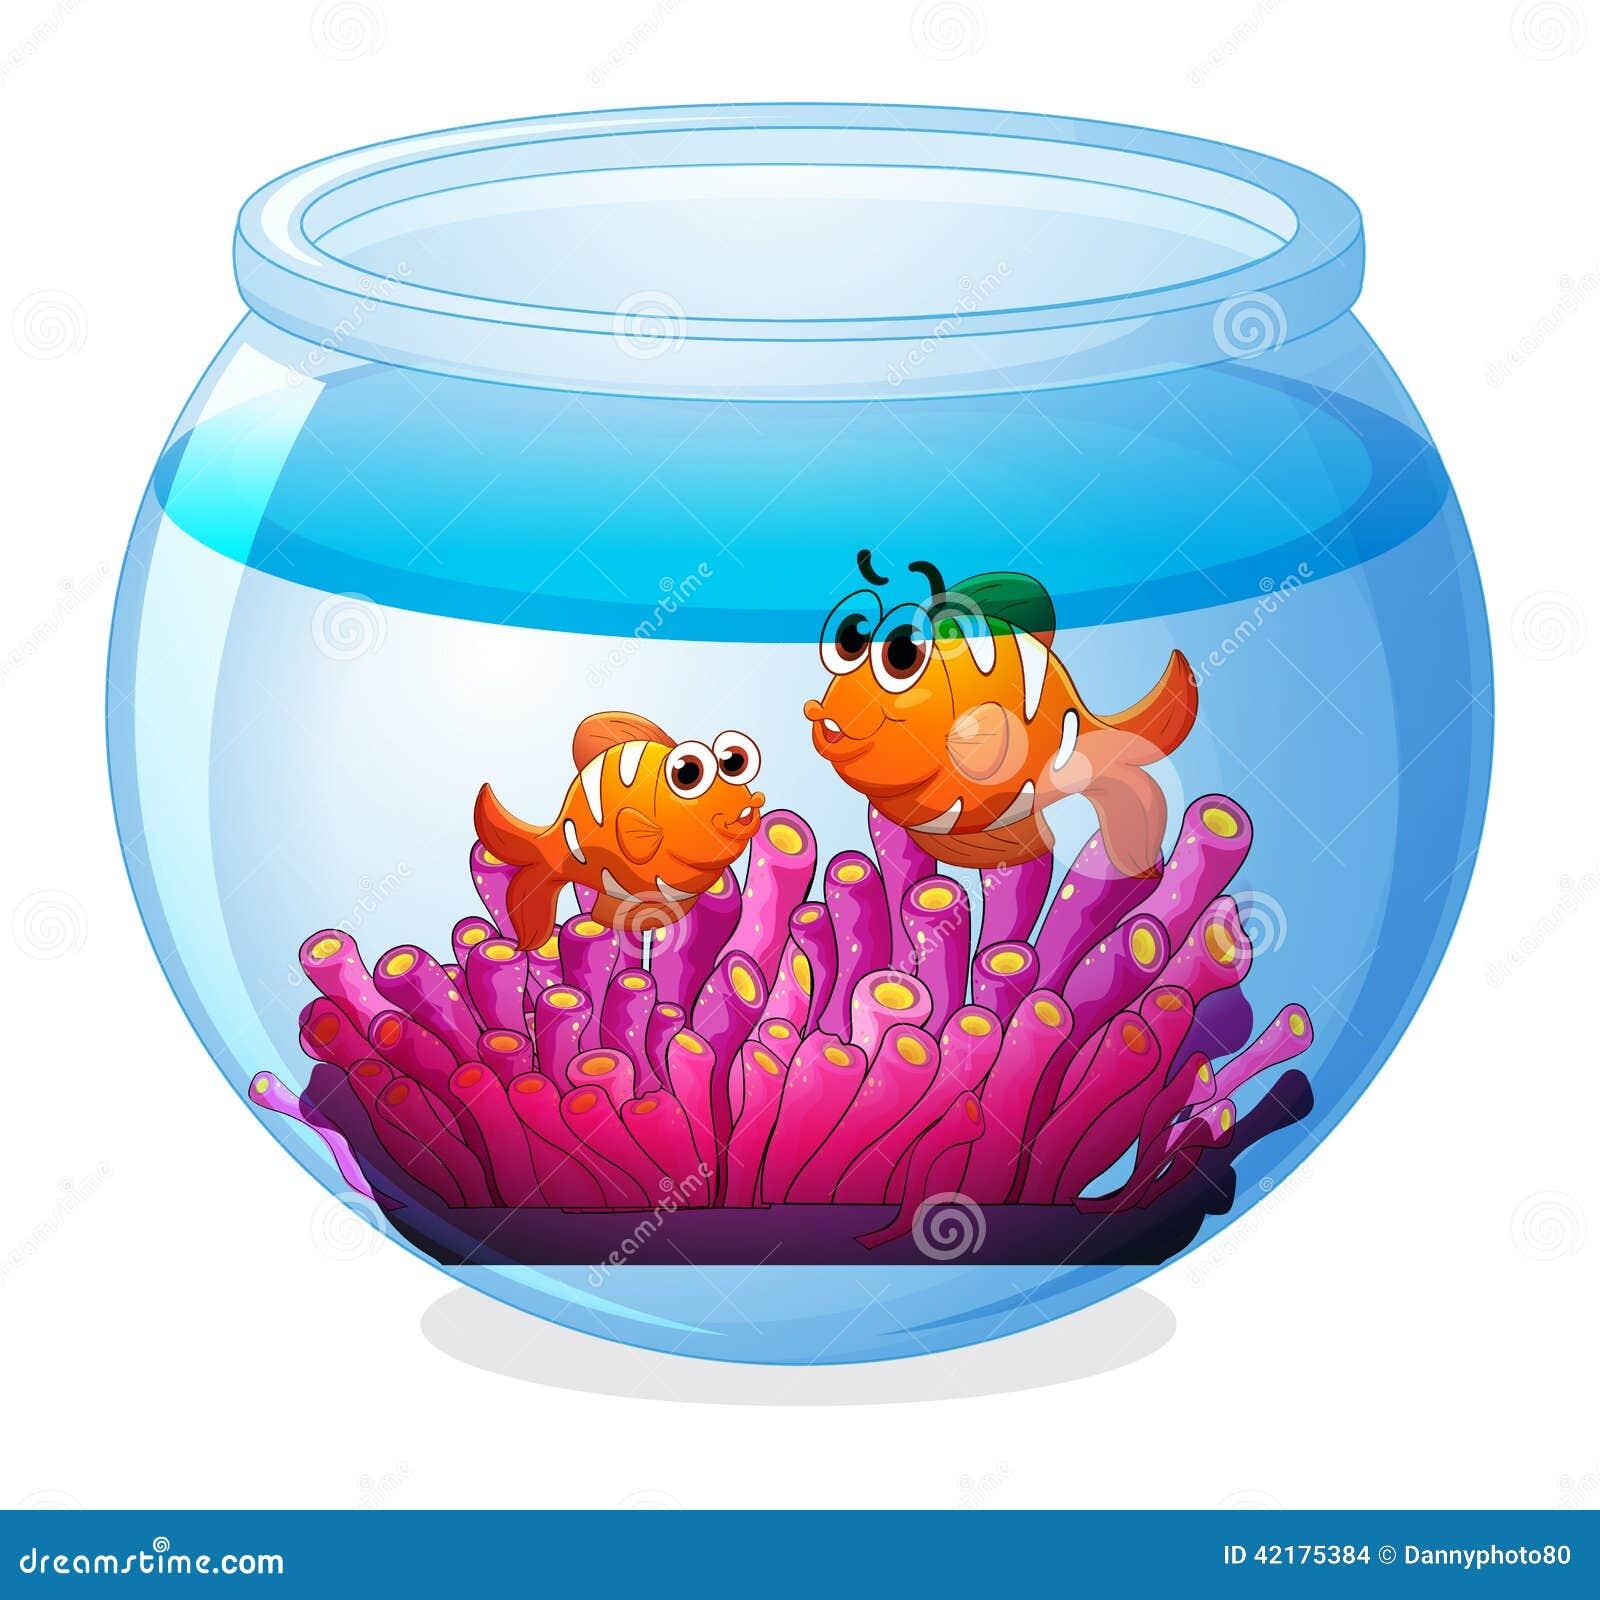 Un aquarium avec deux poissons oranges